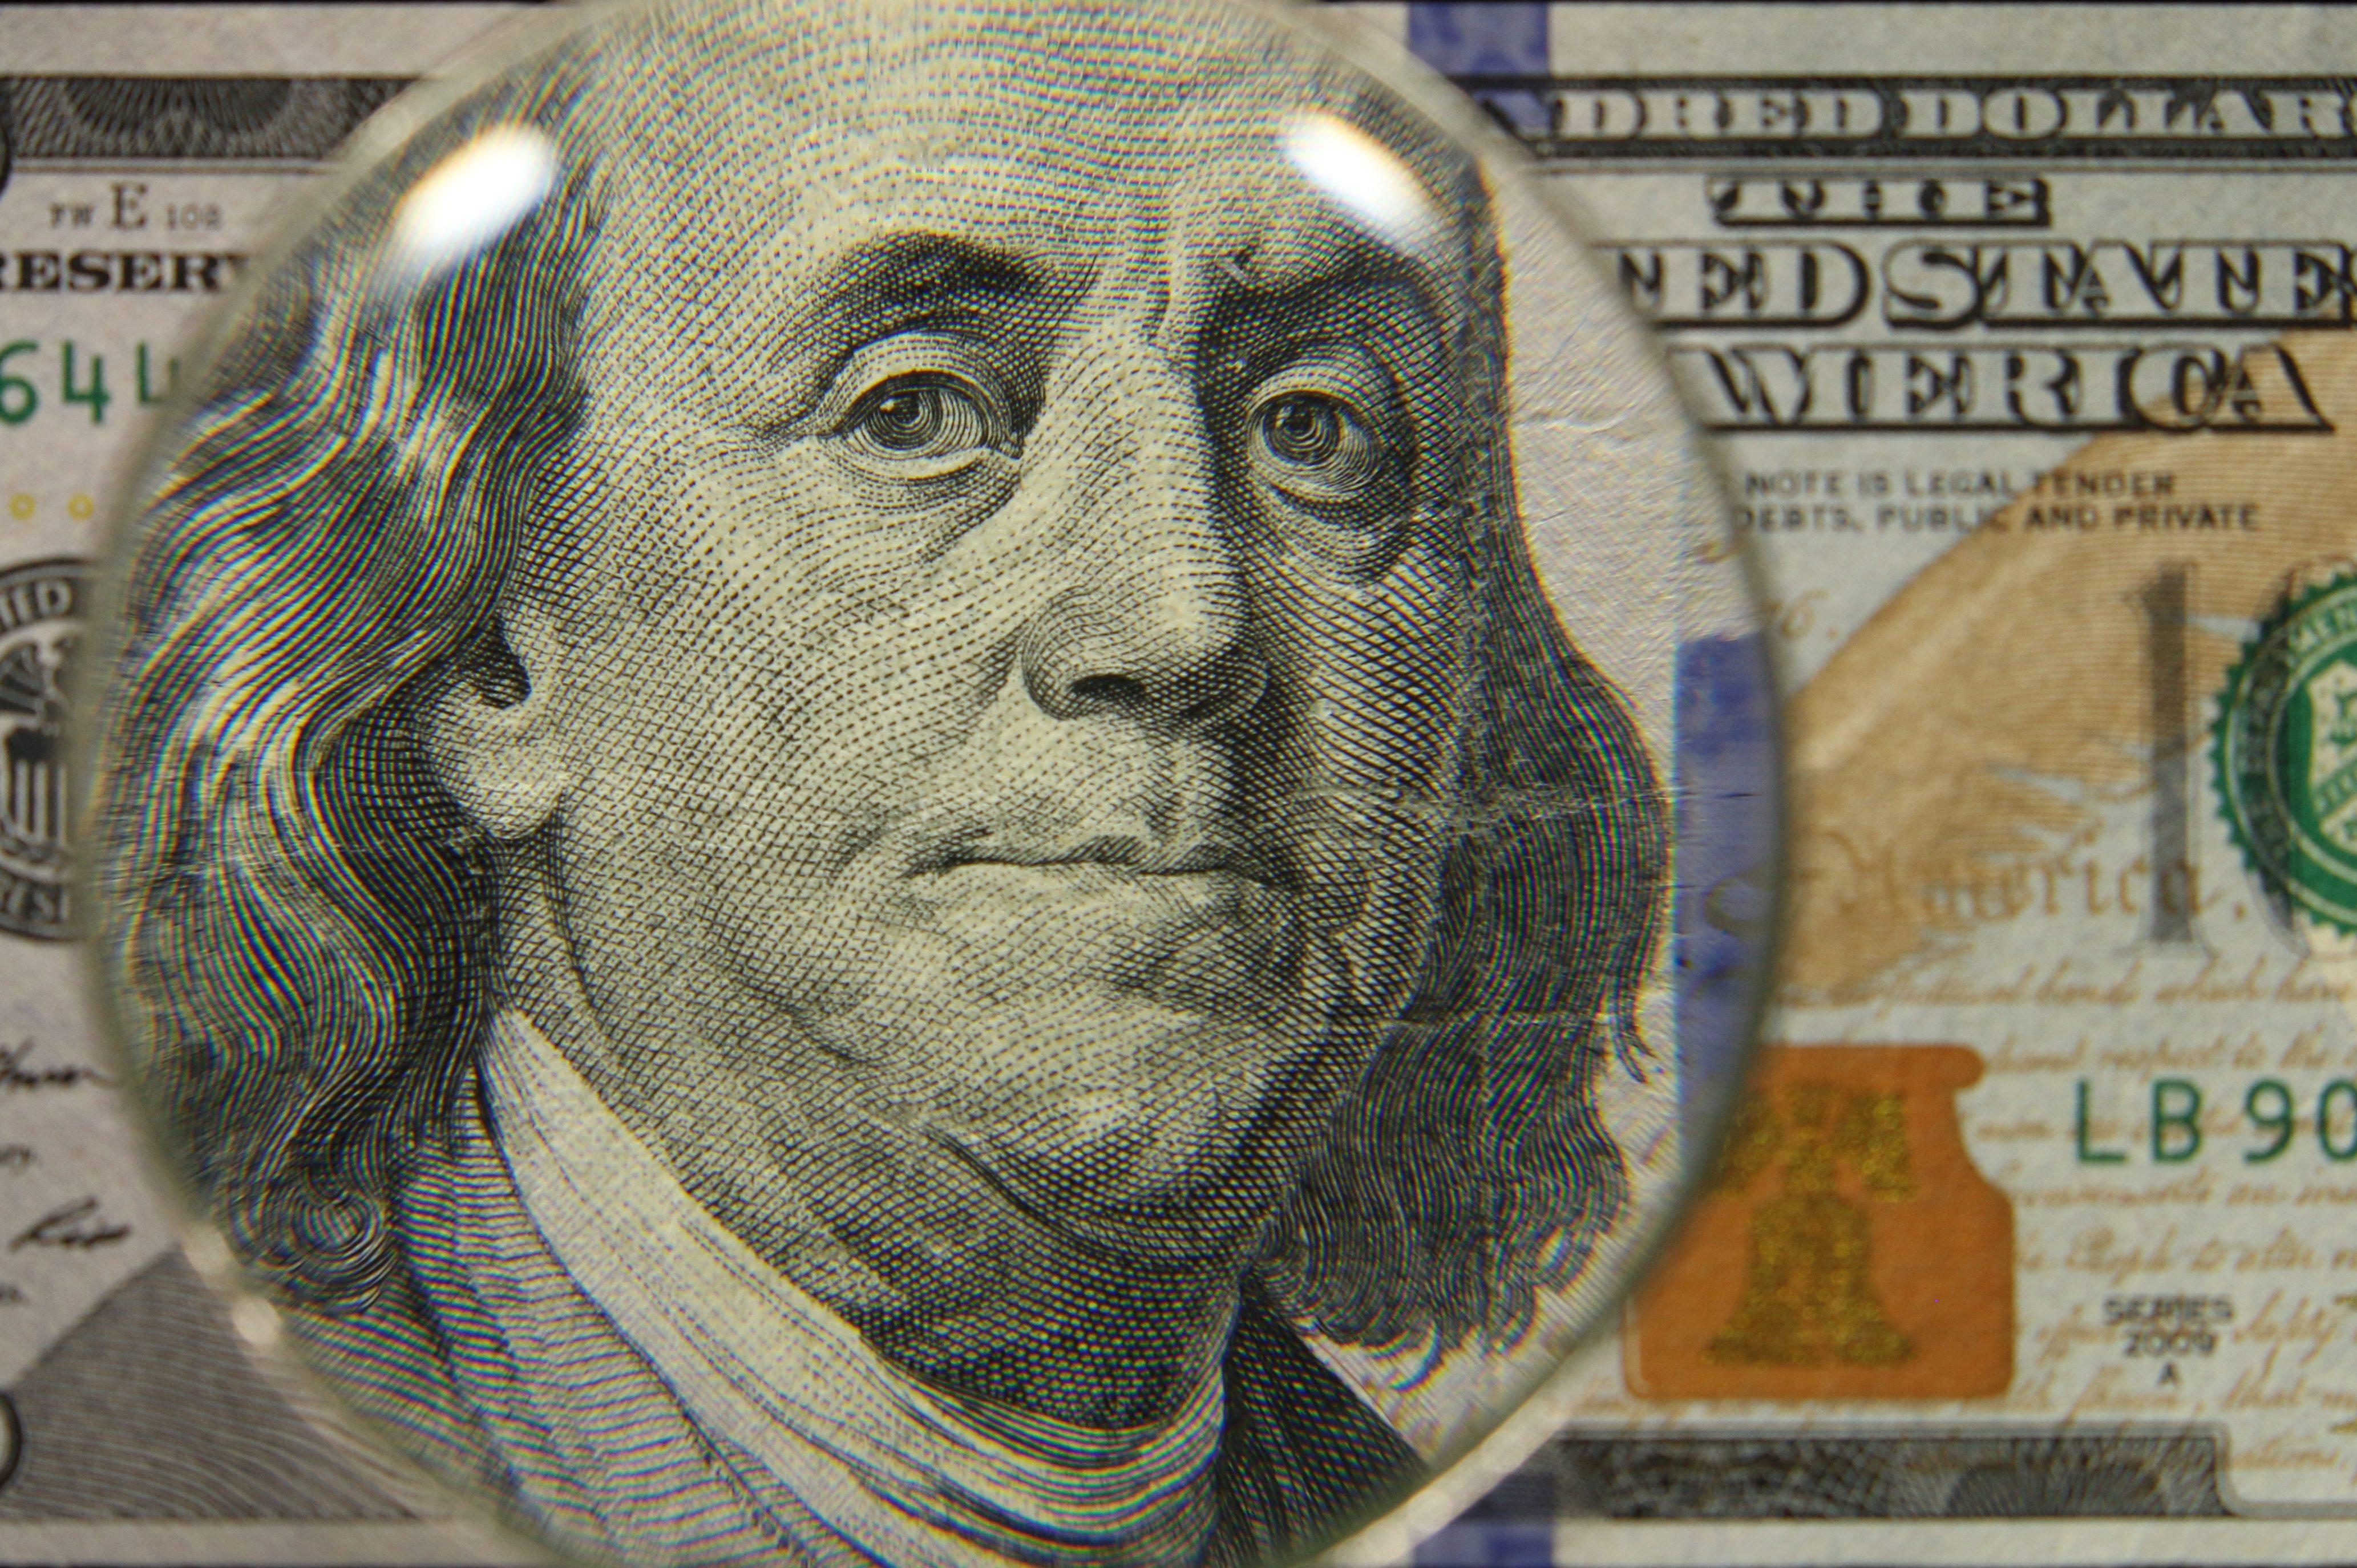 US 100 Obverse Art, Front Lit, Black Background, Magnified, Federal Reserve Note,